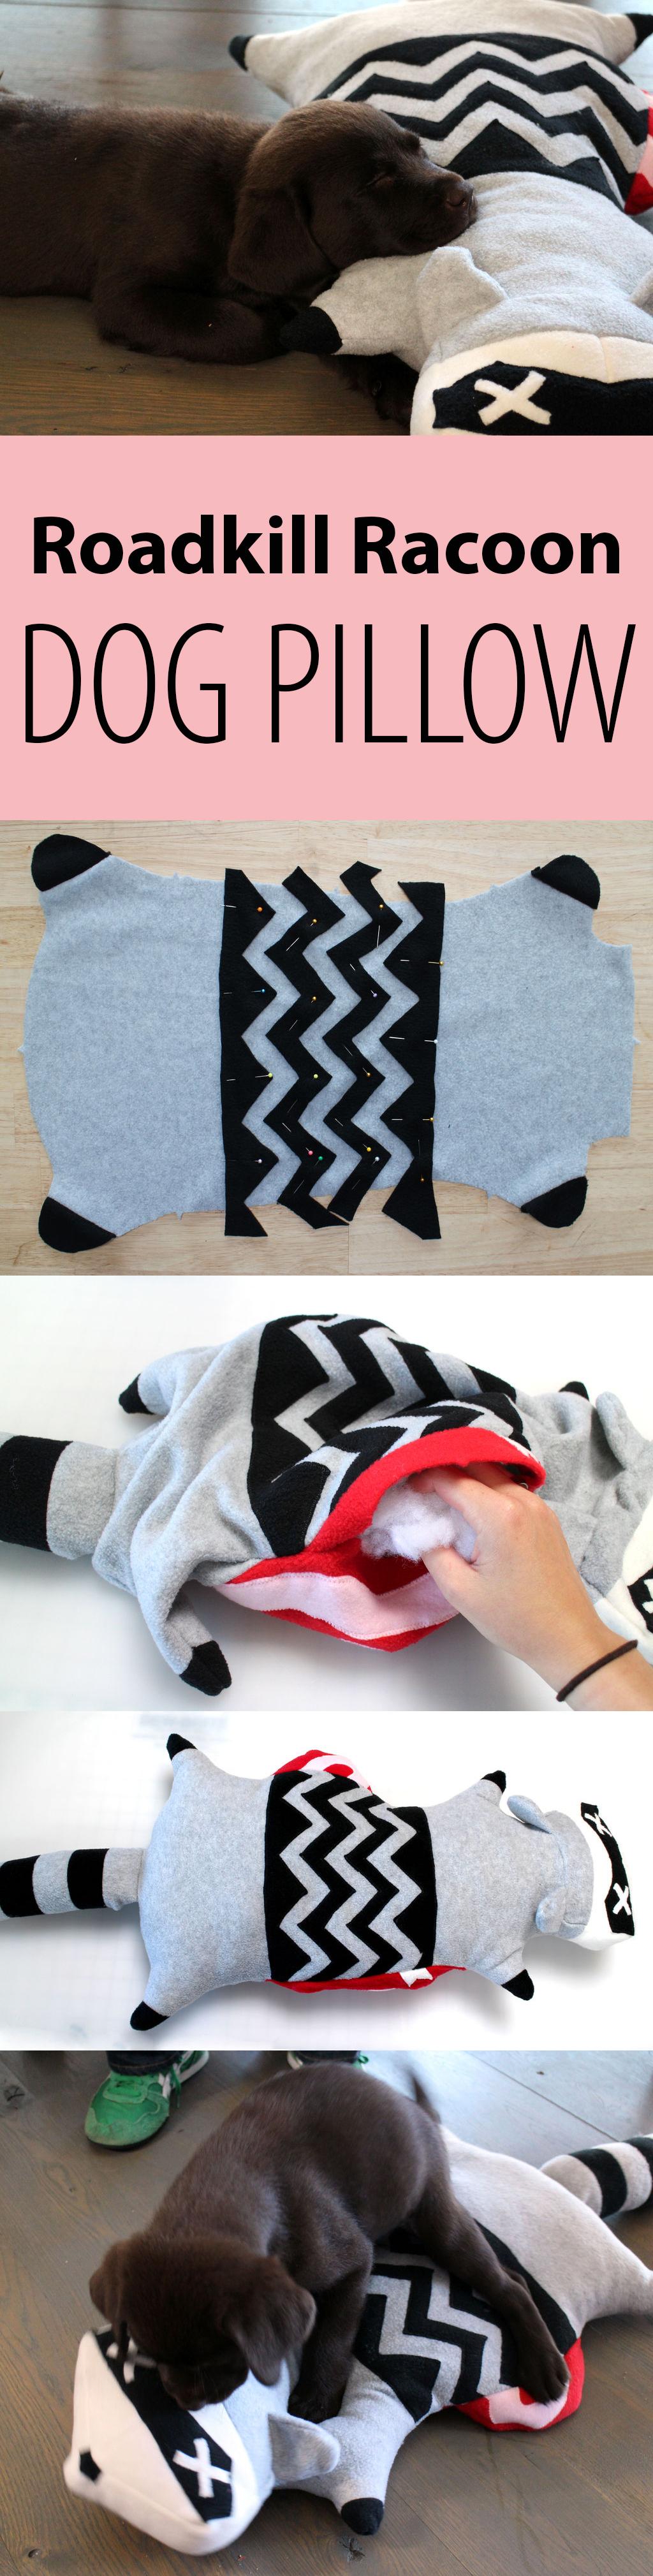 Roadkill raccoon dog pillow dog raccoons and pillows